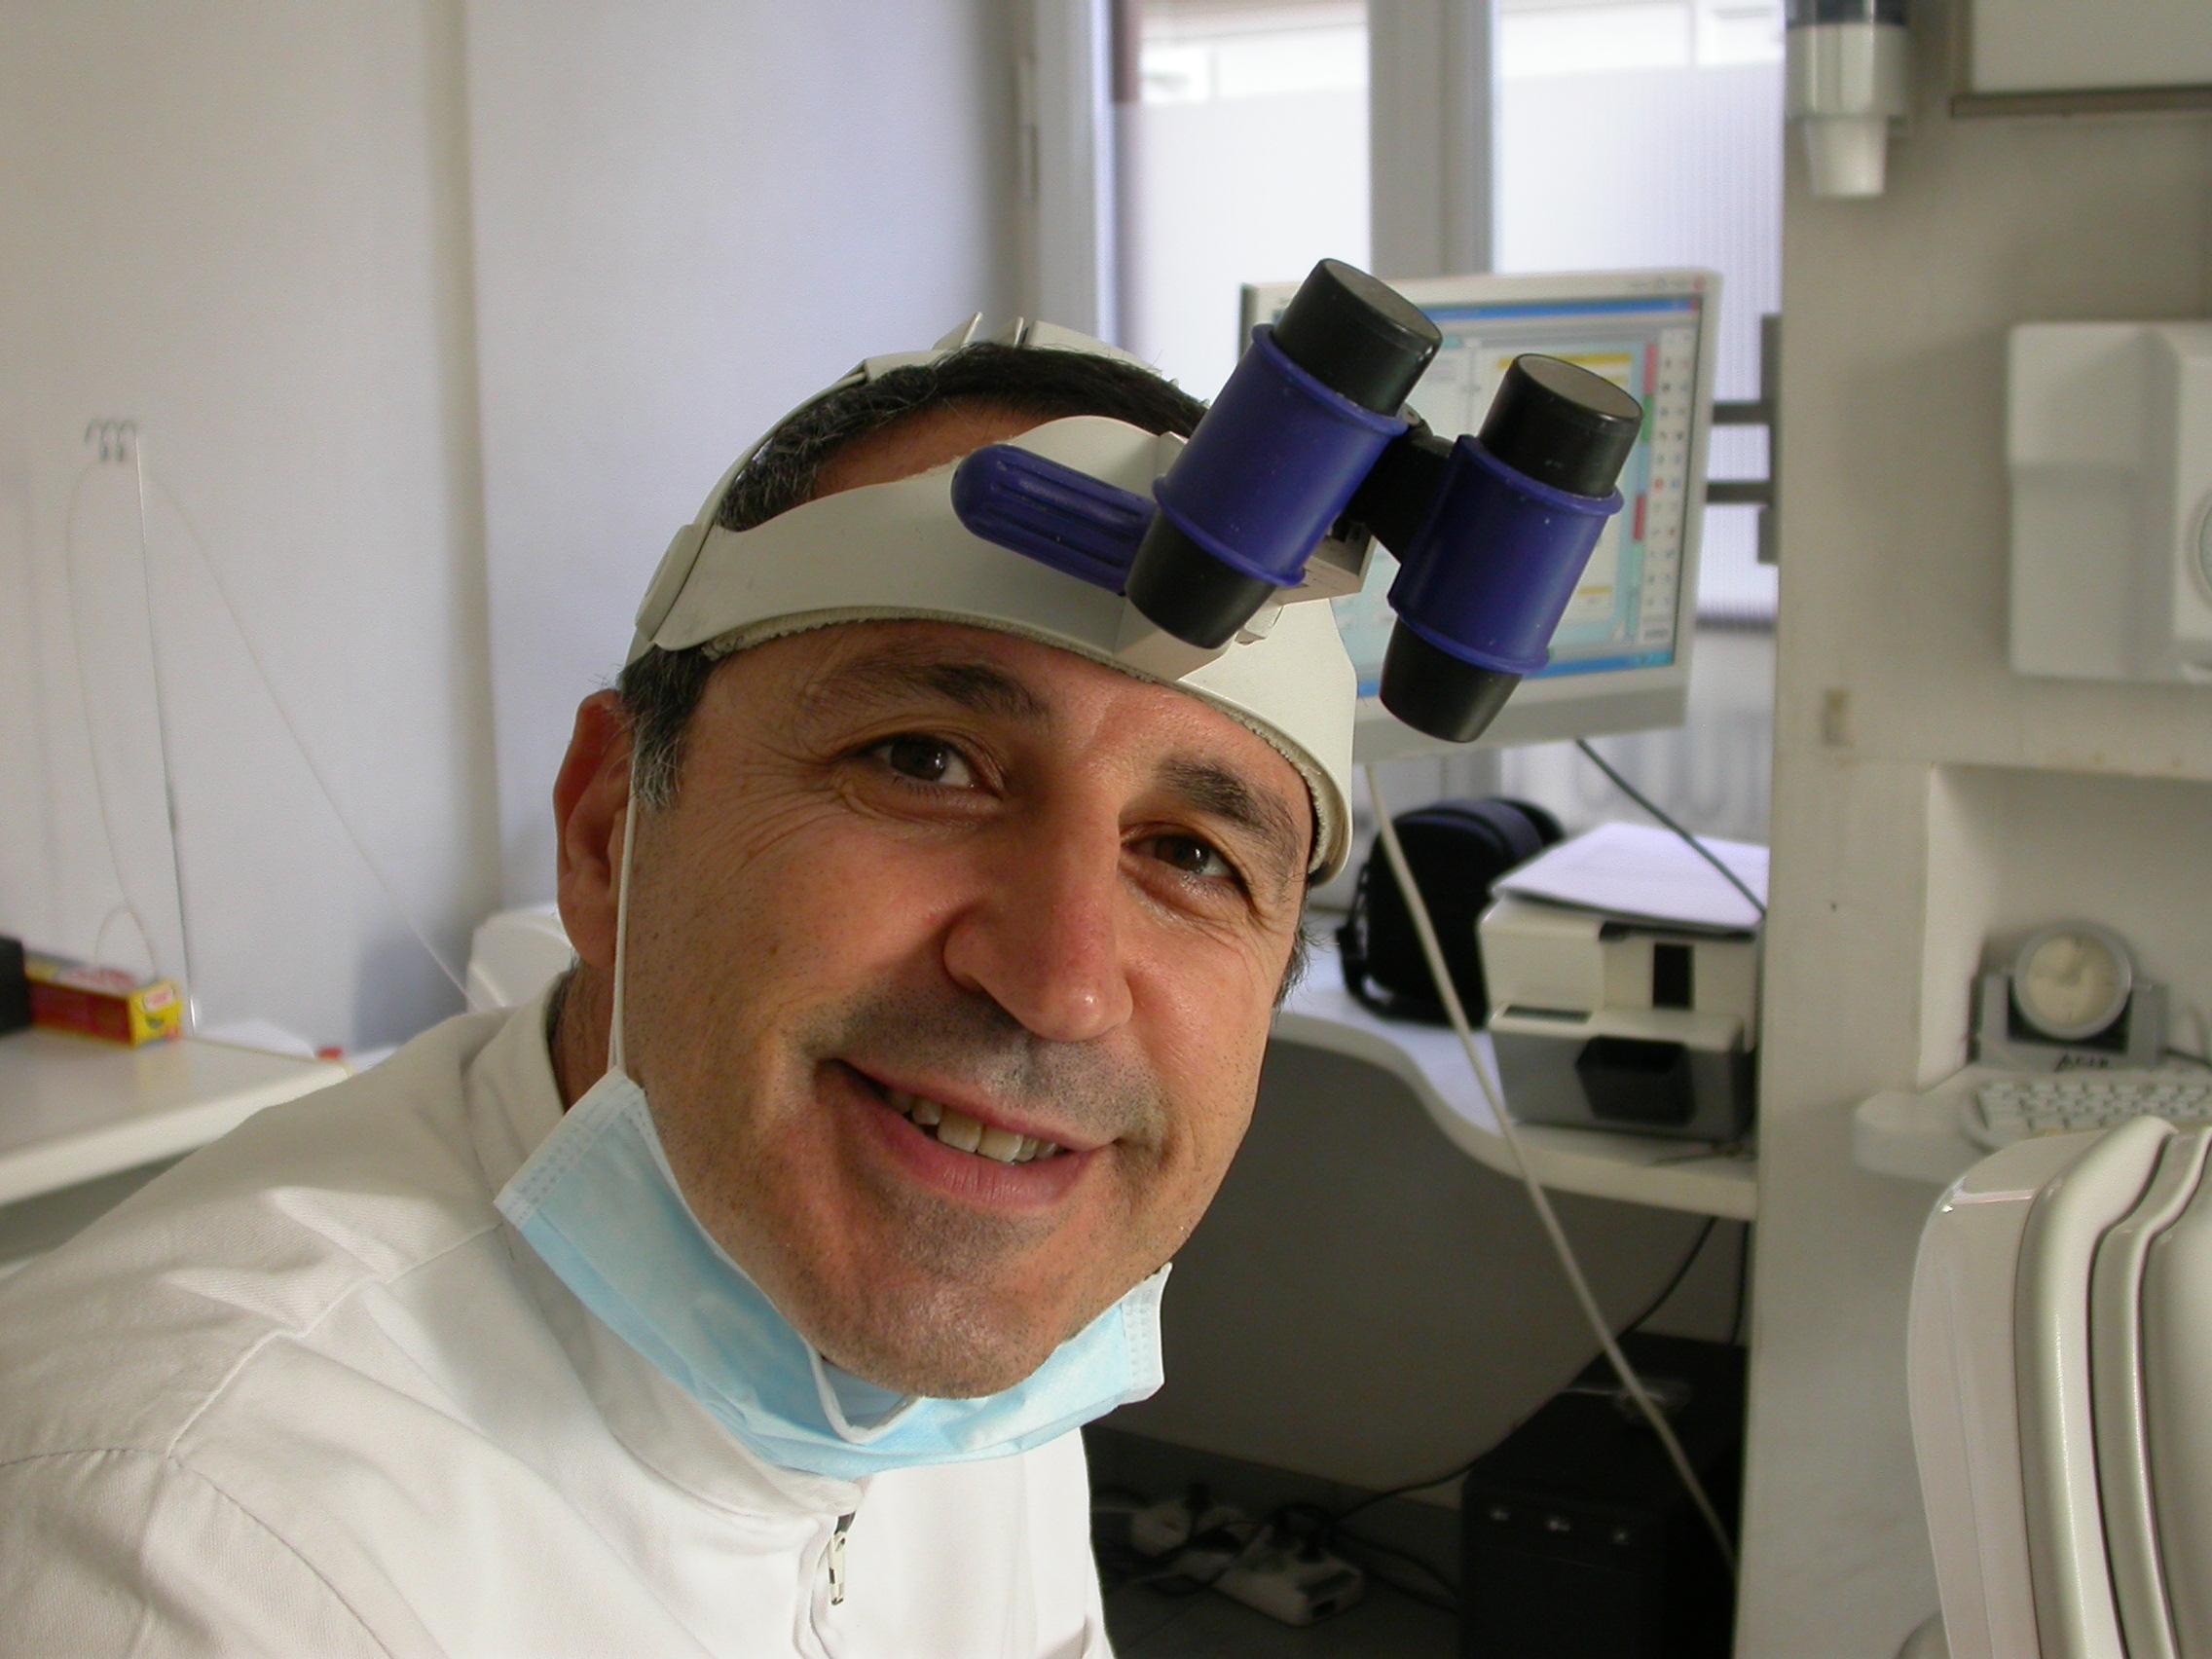 Dott Carlo Danesi